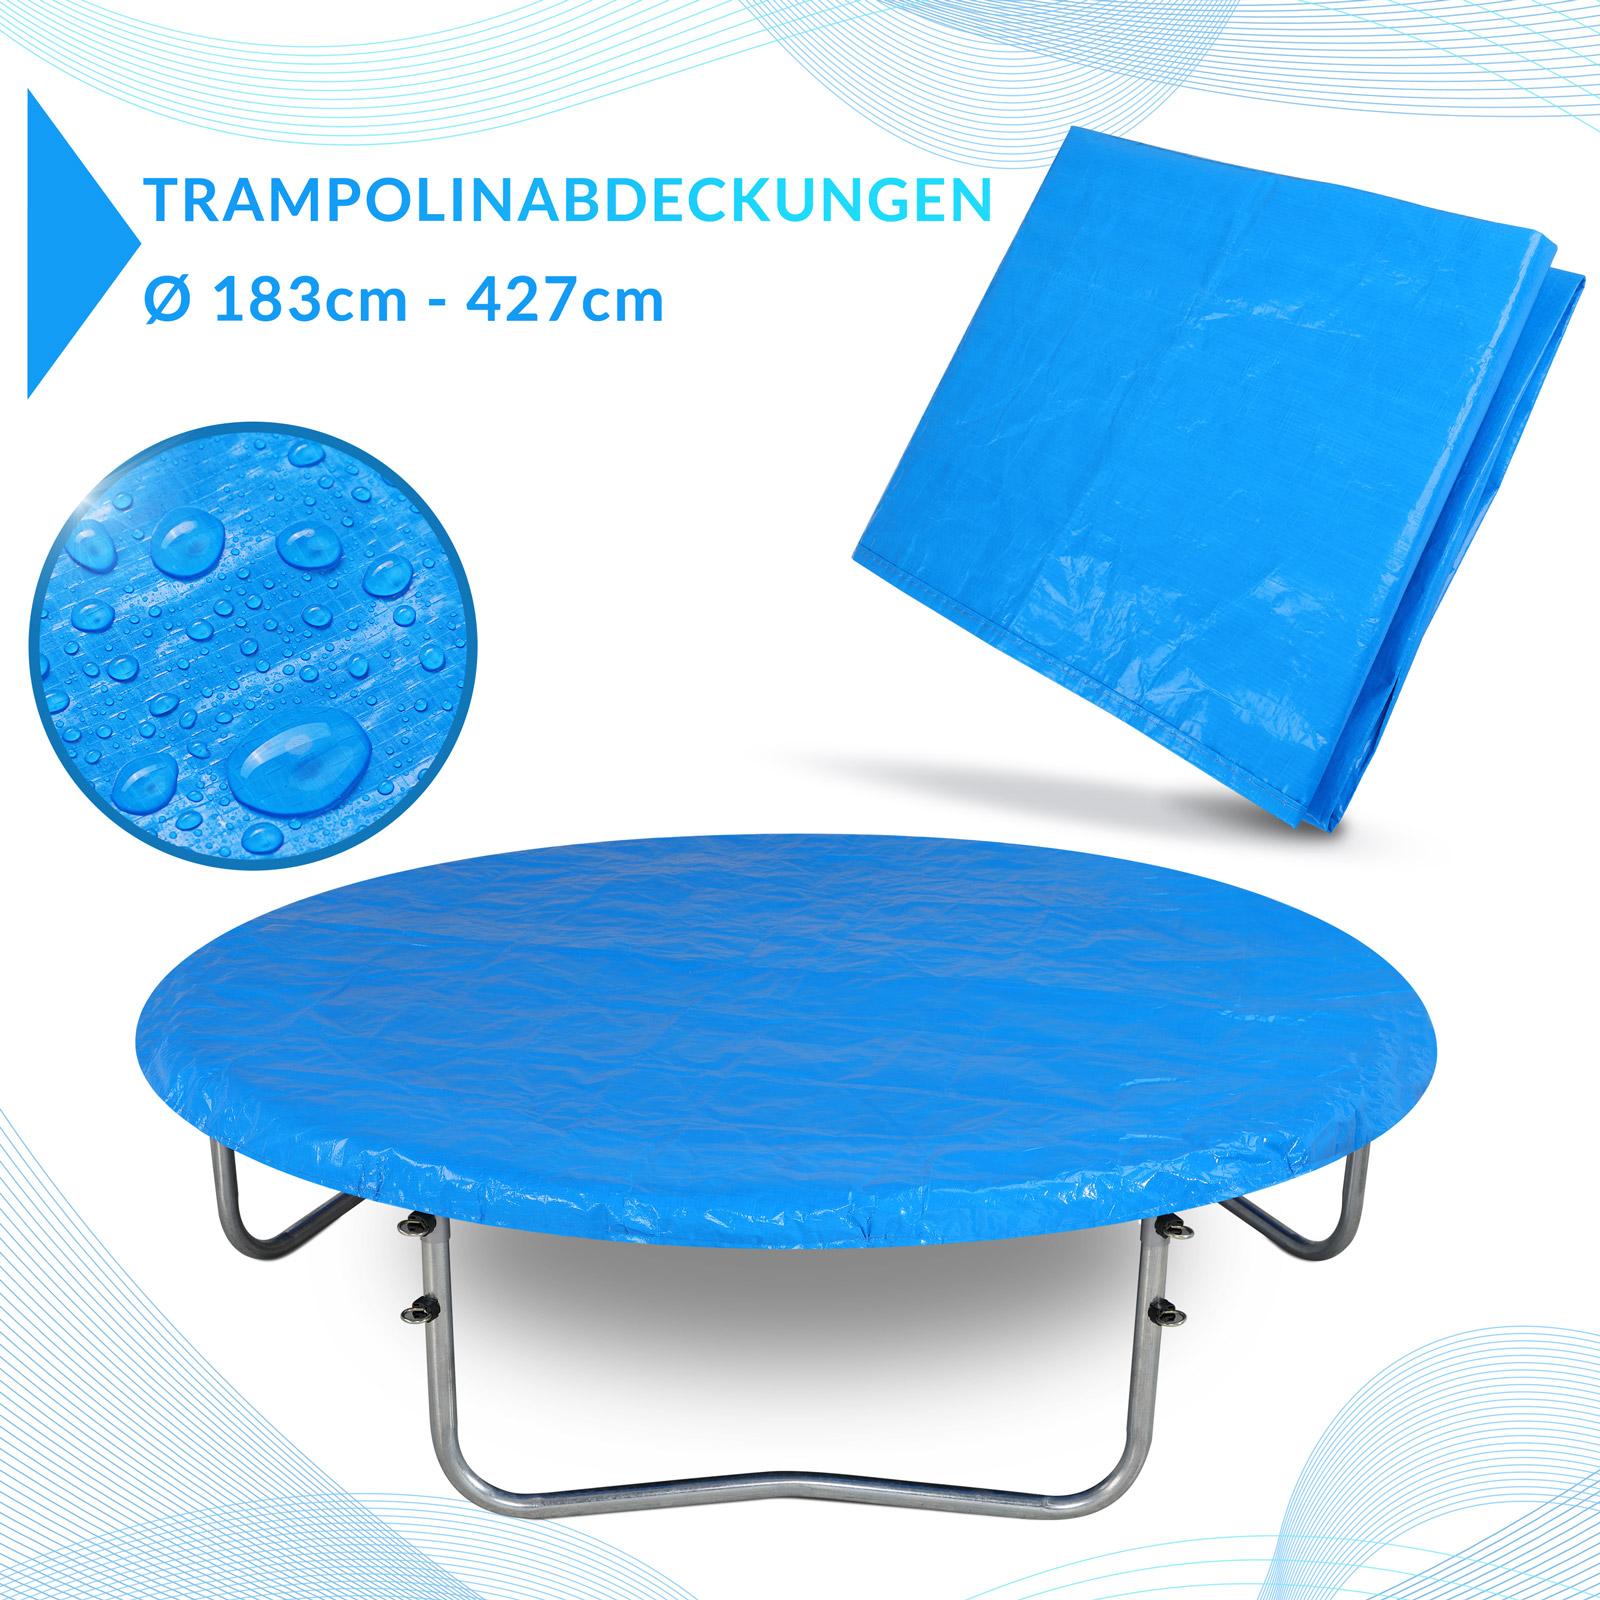 Trampoline green rain cover 244 426 cm waterproof weather protective cover - Protection trampoline 244 ...